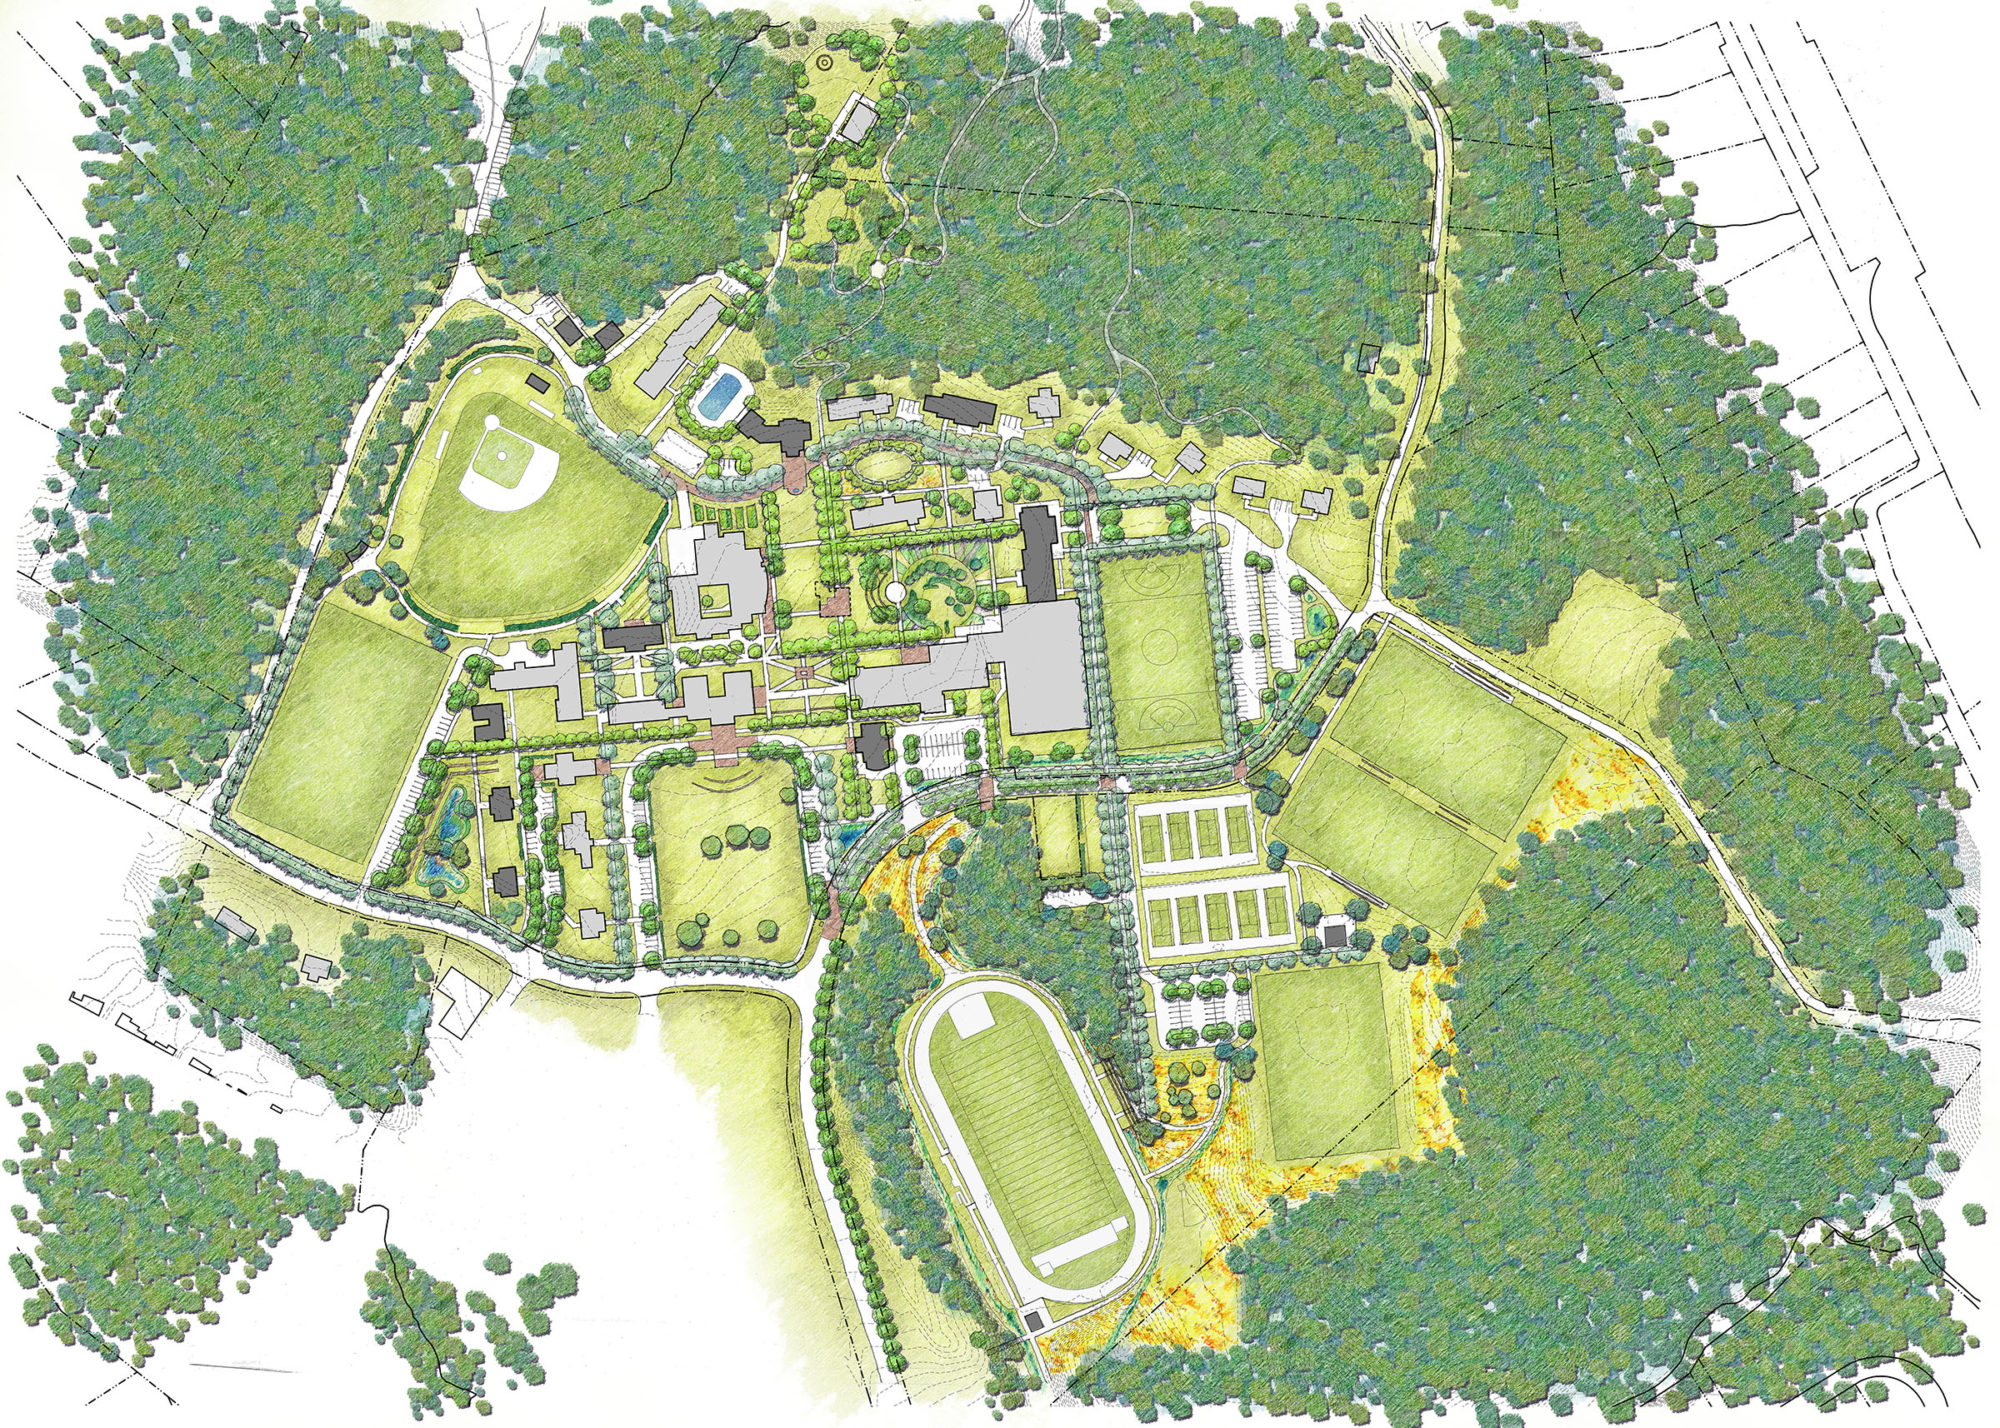 Virginia Episcopal Campus Master Plan Glave Holmes Architecture